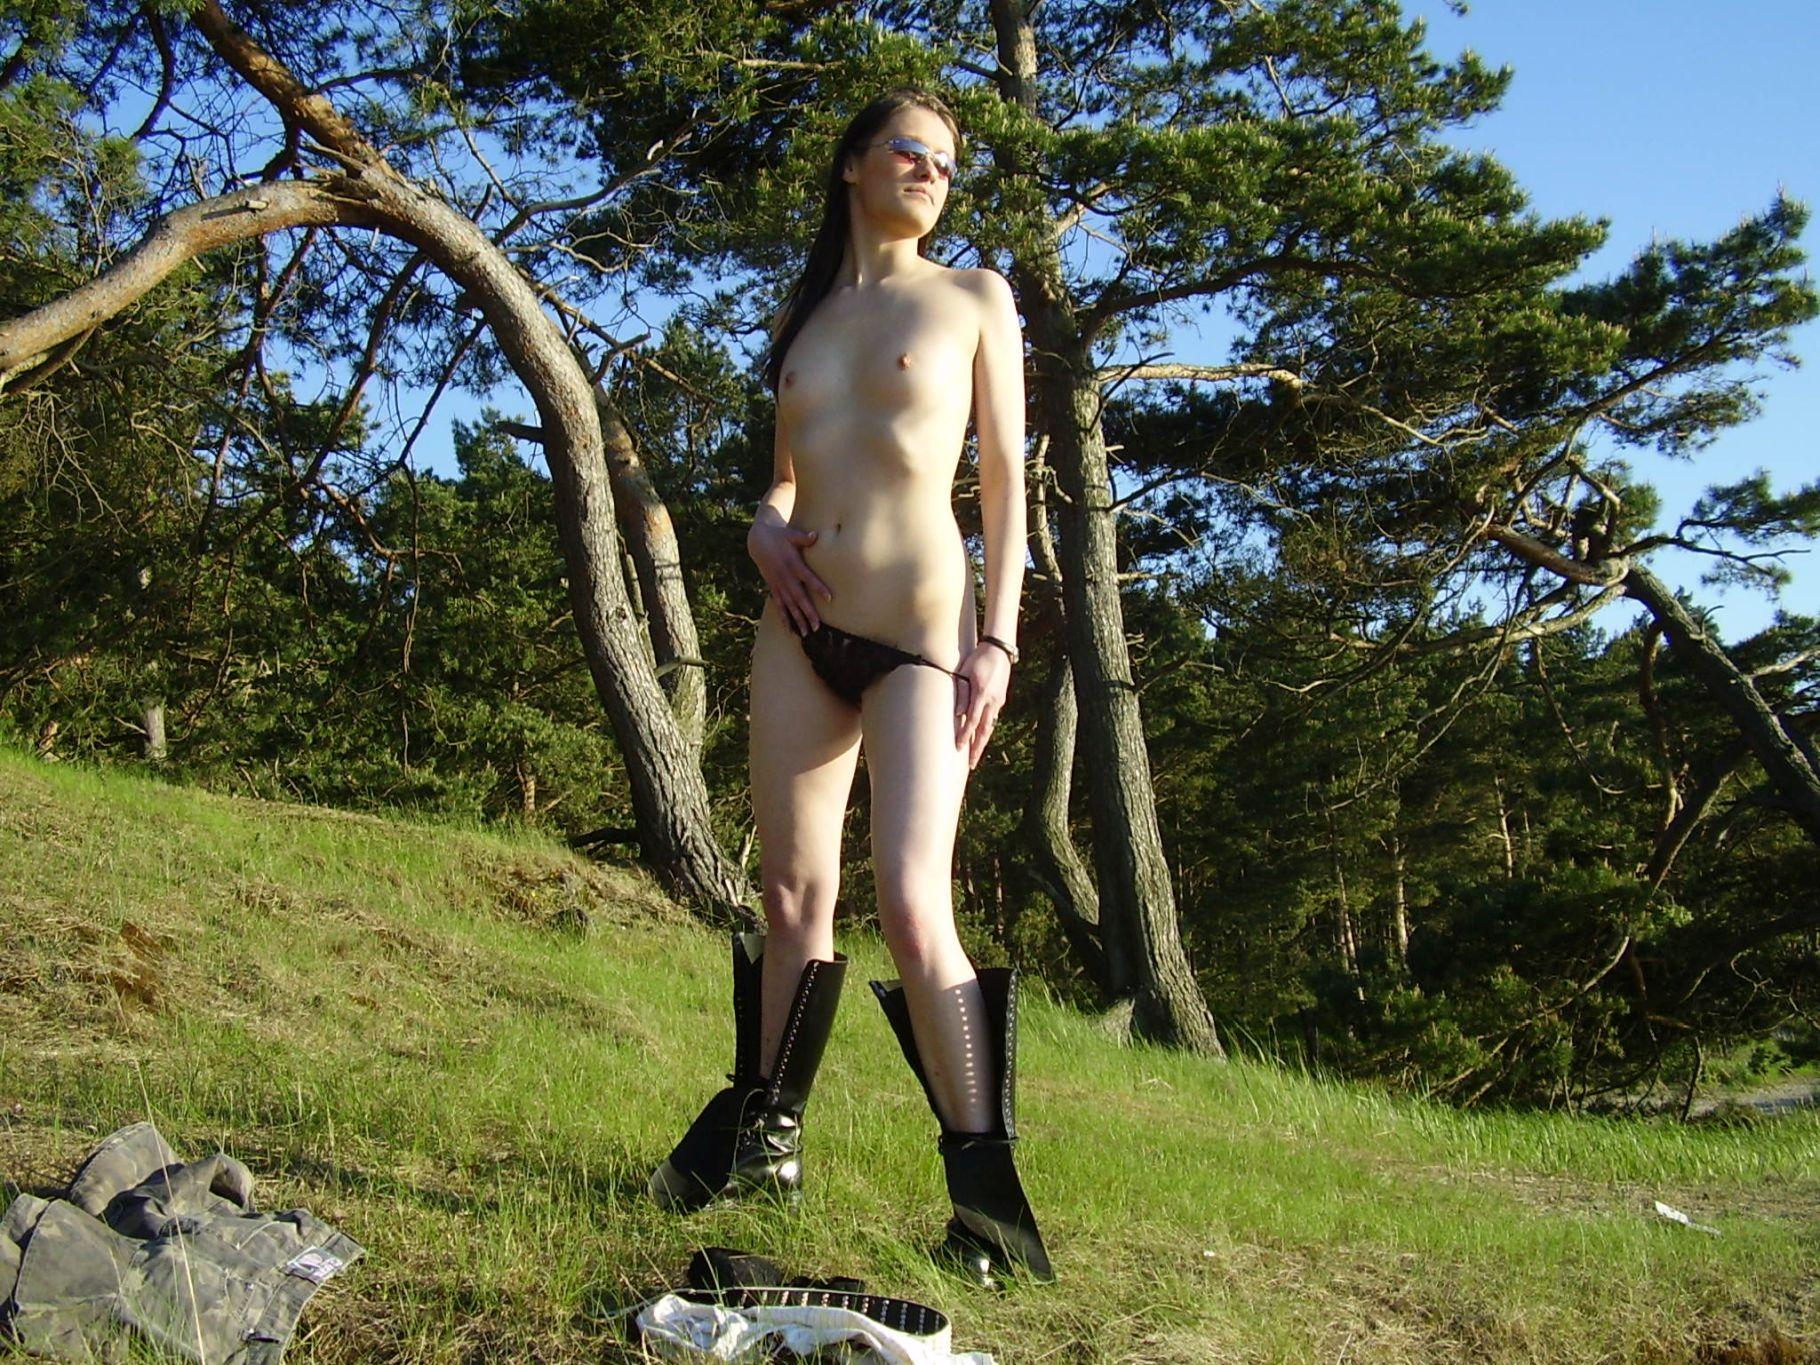 Saskia, 26, Warendorf